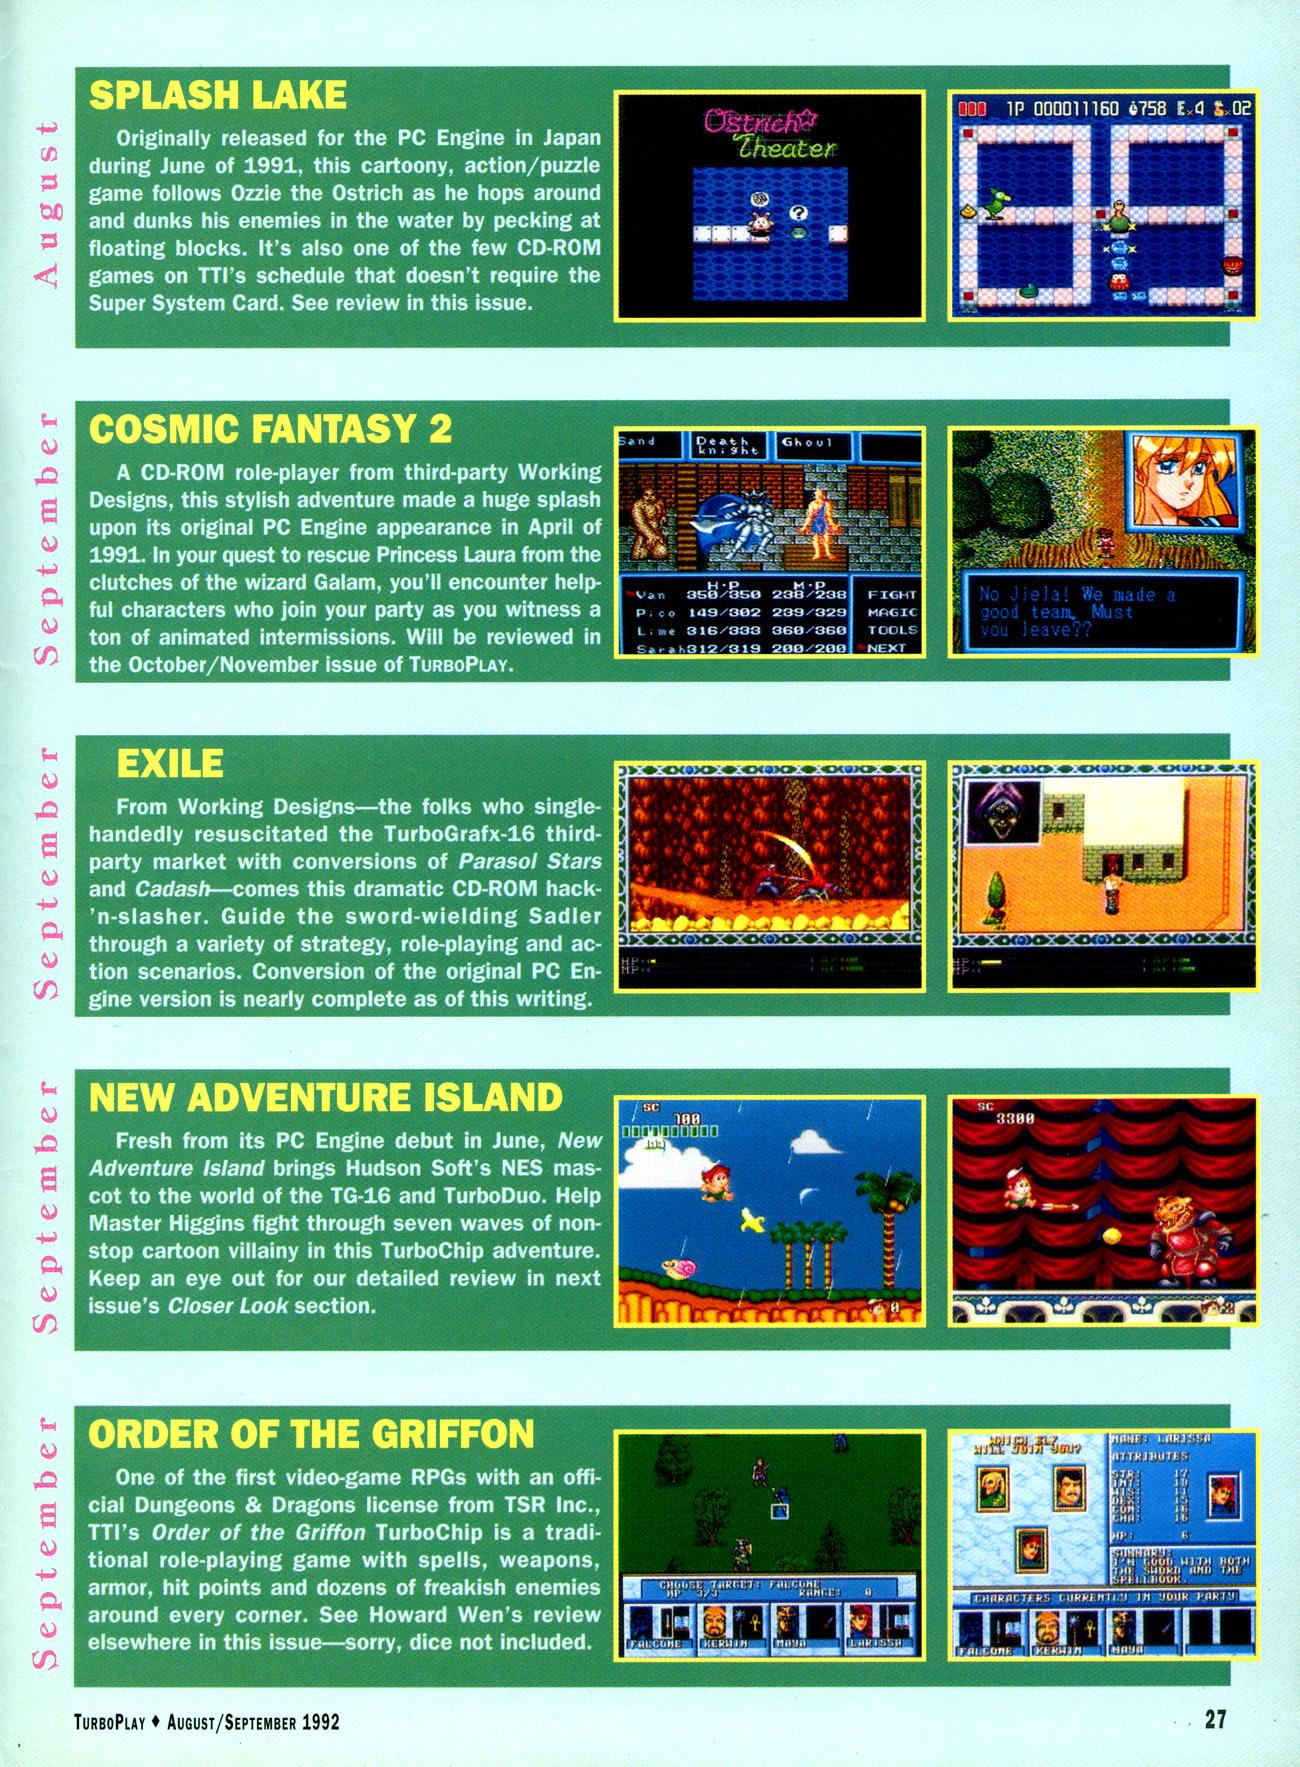 TurboPlay Magazine #14 (August/September 1992) :: TurboPlay